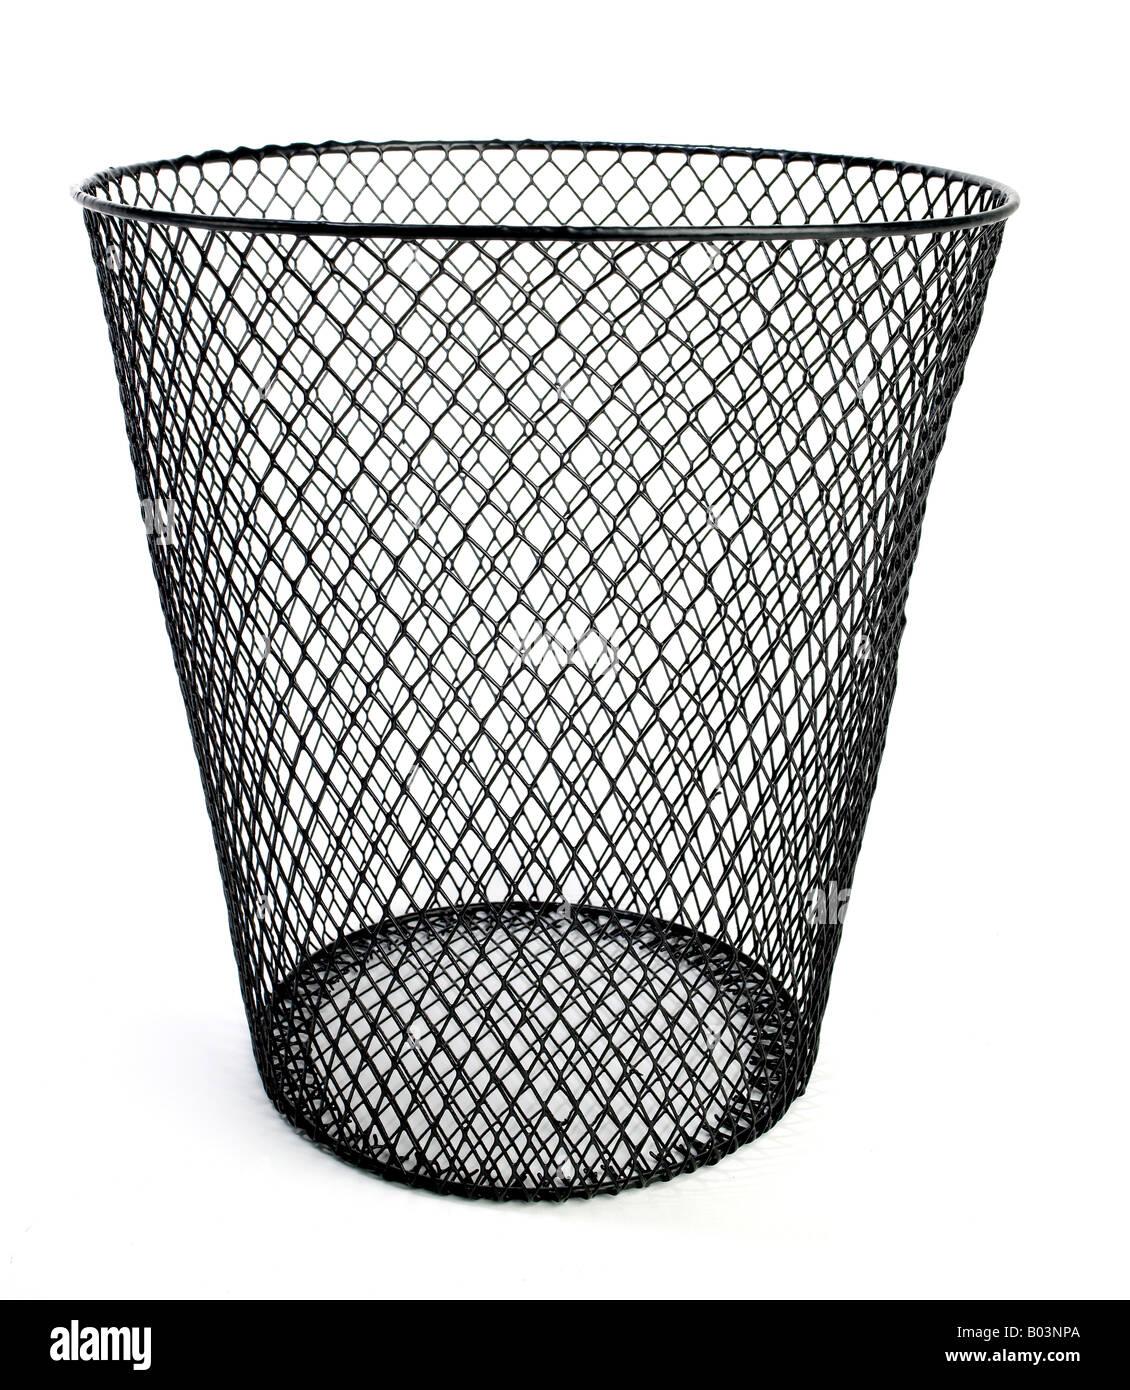 Waste Paper Basket Stockfotos & Waste Paper Basket Bilder - Alamy